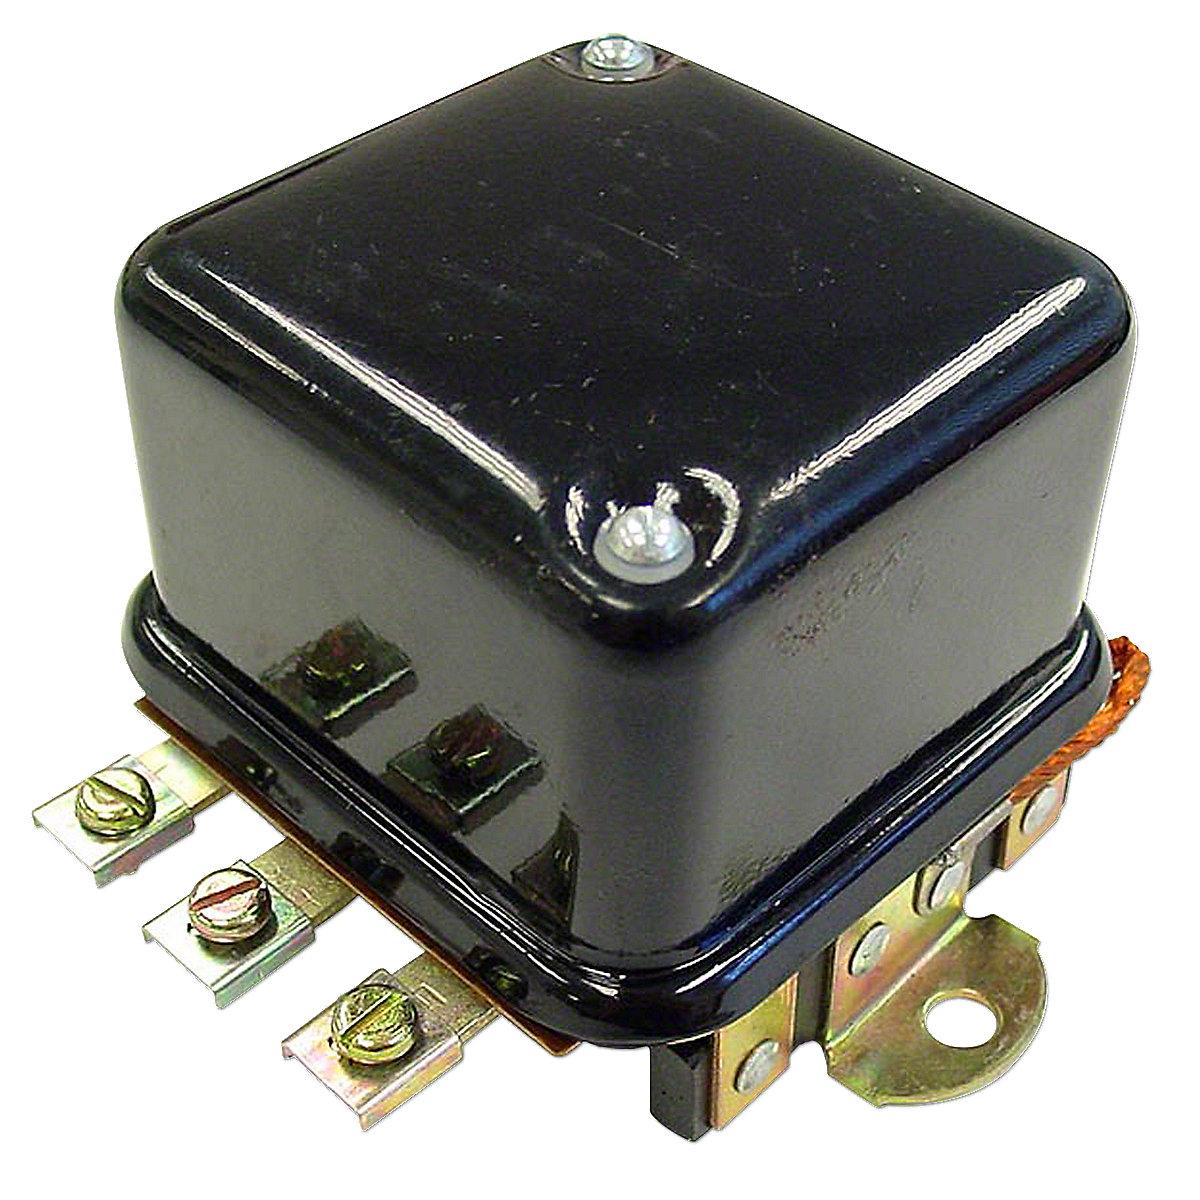 ABC1526 Volt External Voltage Regulator